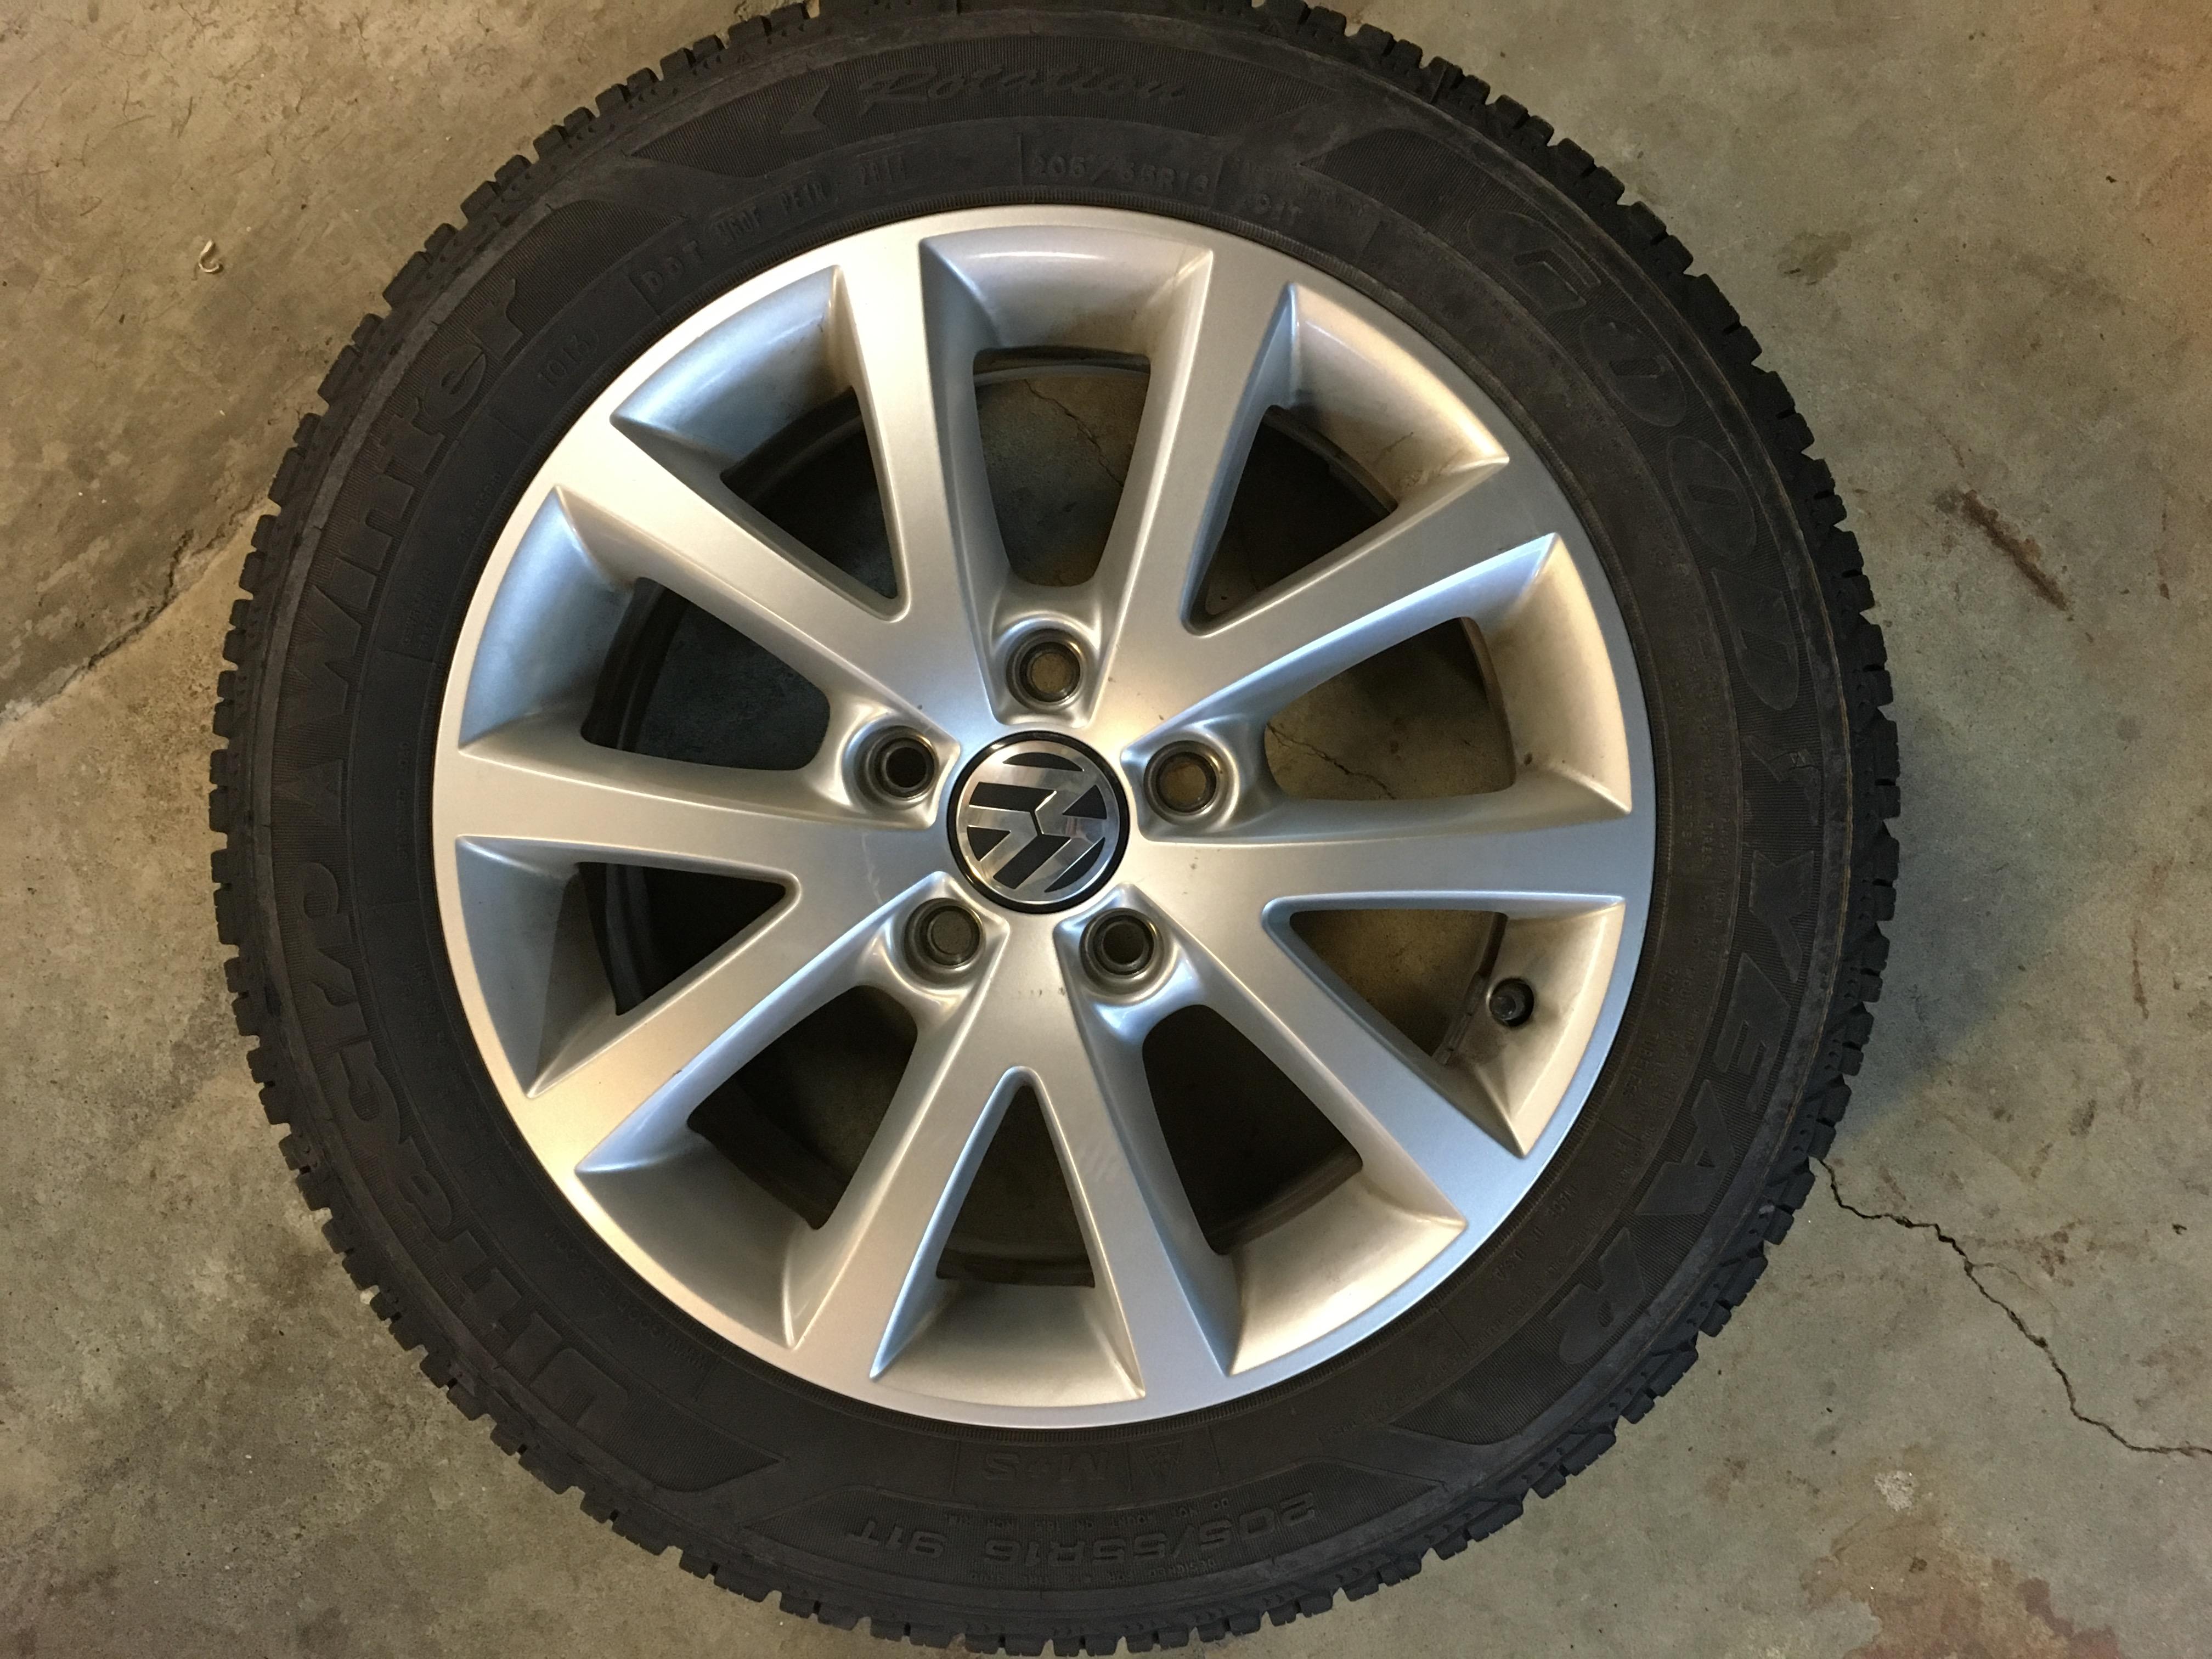 "Volkswagen Jetta Rims >> VWVortex.com - MK6 Jetta 16"" OEM rims with all season tires & 16' steelies with winter tires"